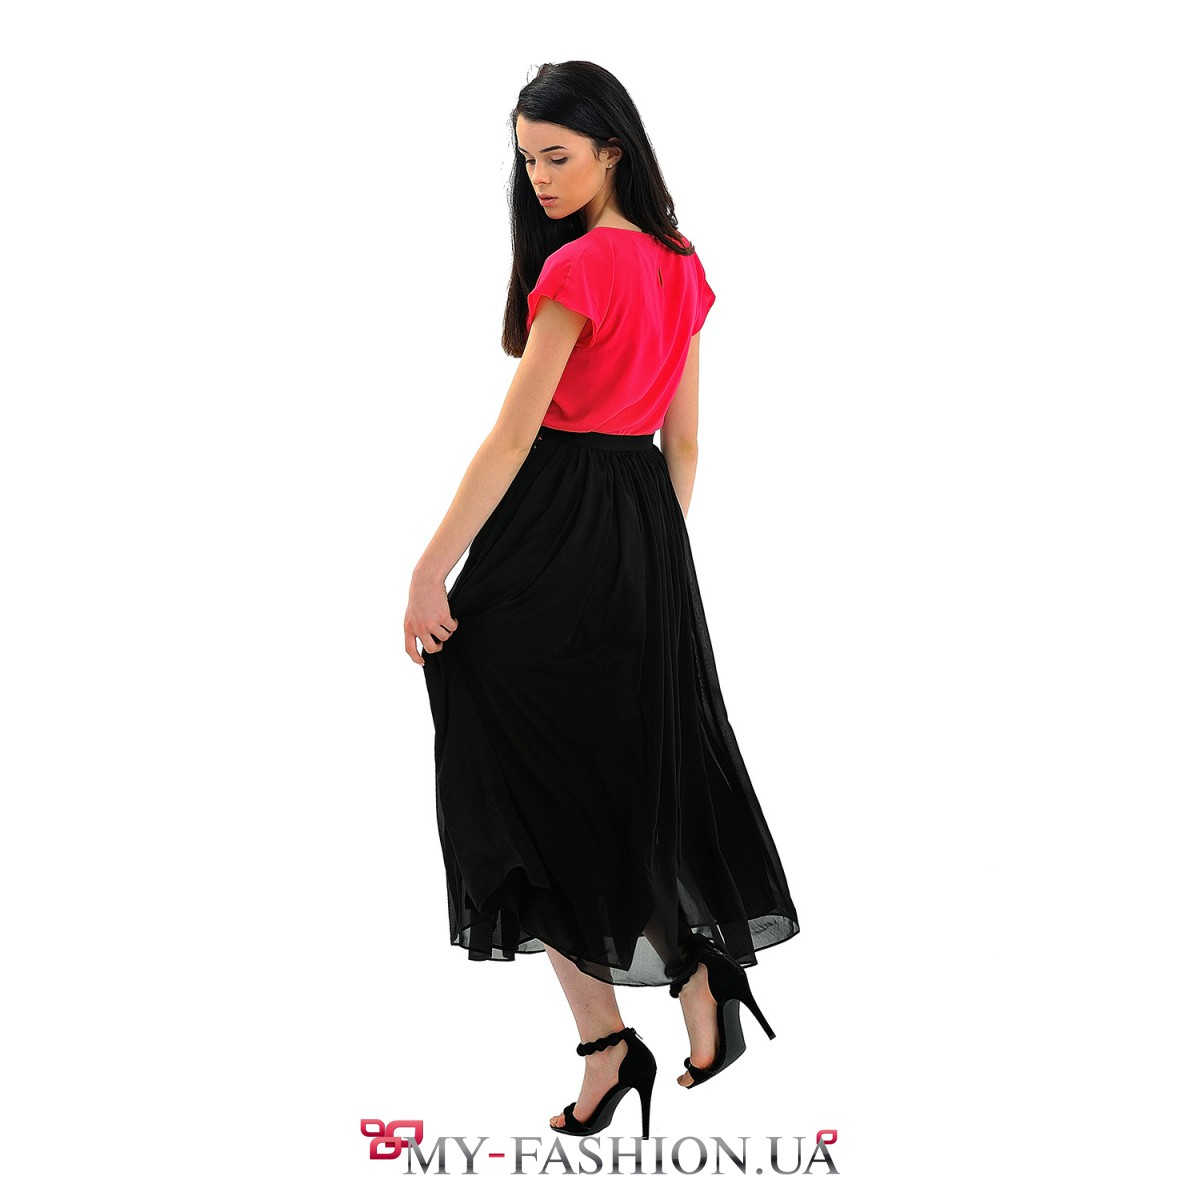 Черная юбка и черная блузка доставка